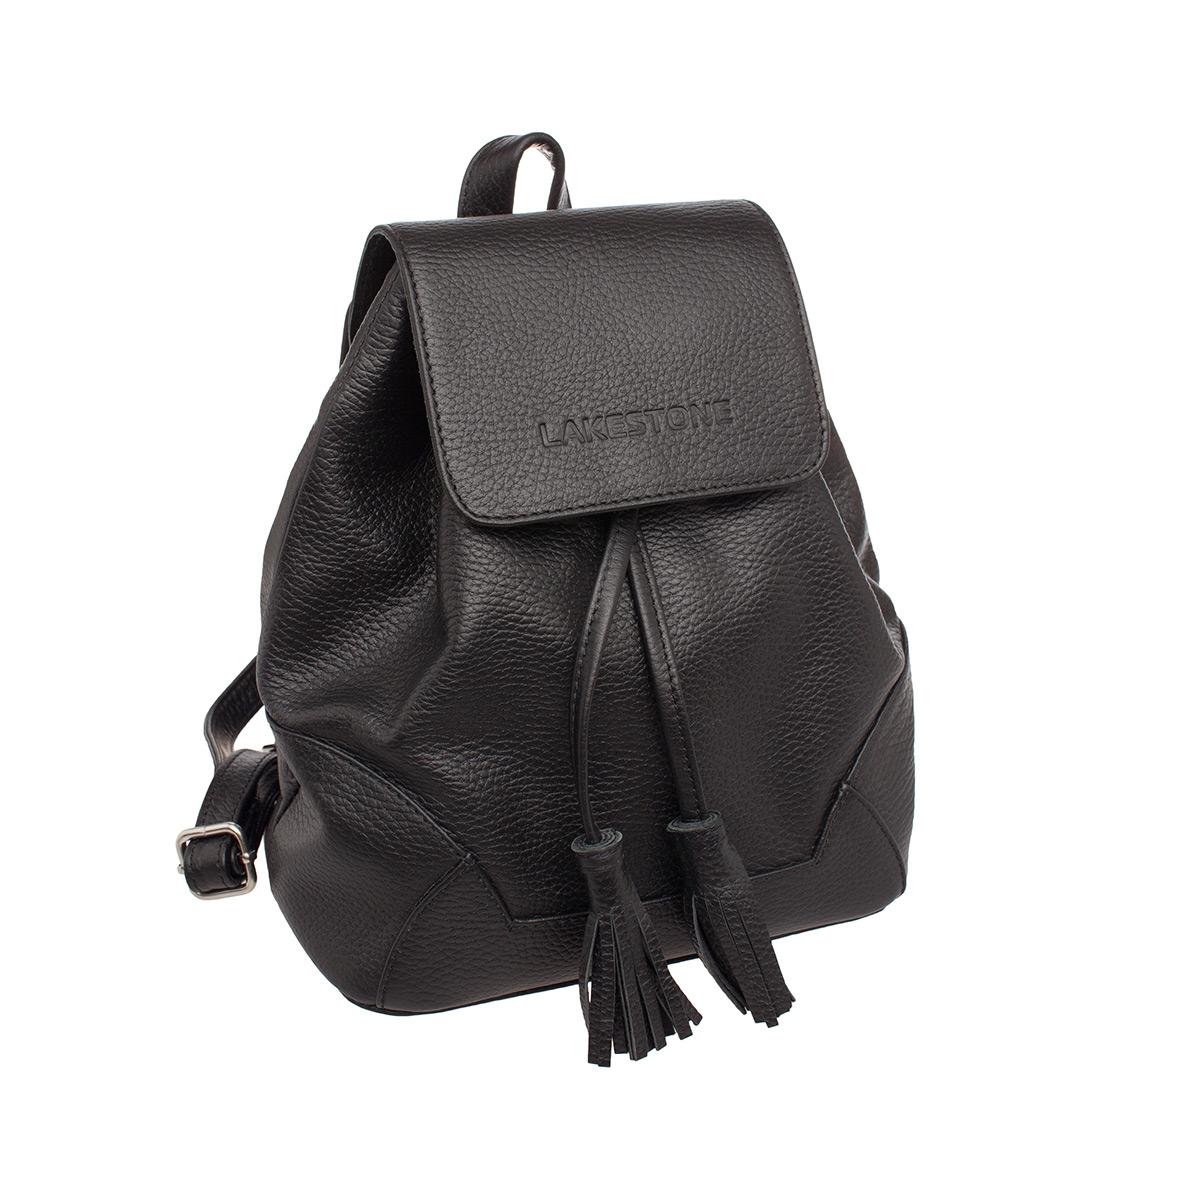 Рюкзак женский кожаный Lakestone 9123417/BL фото